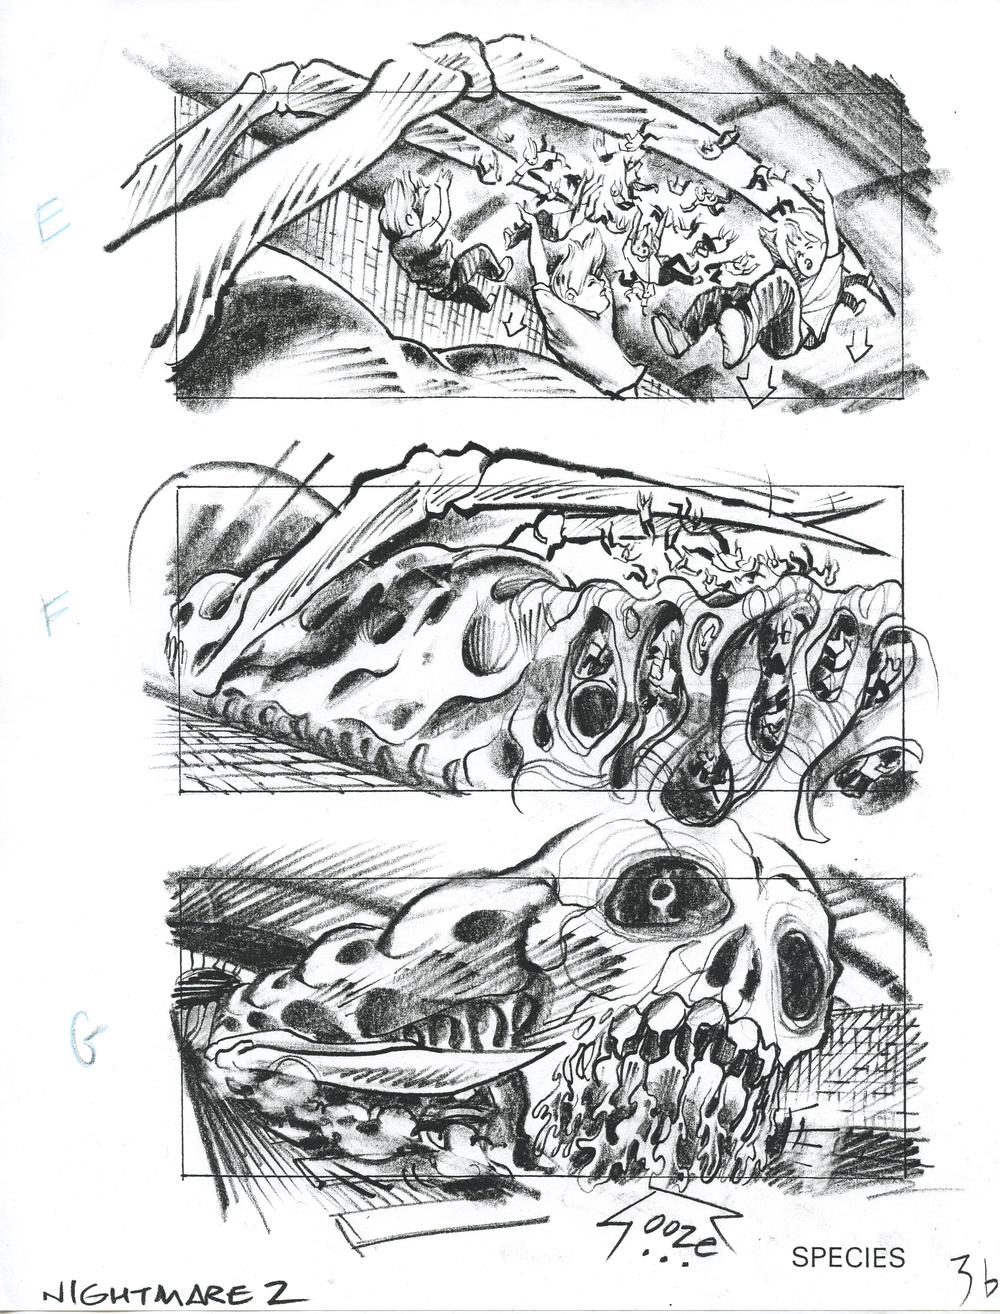 Species 1 (copy).jpg